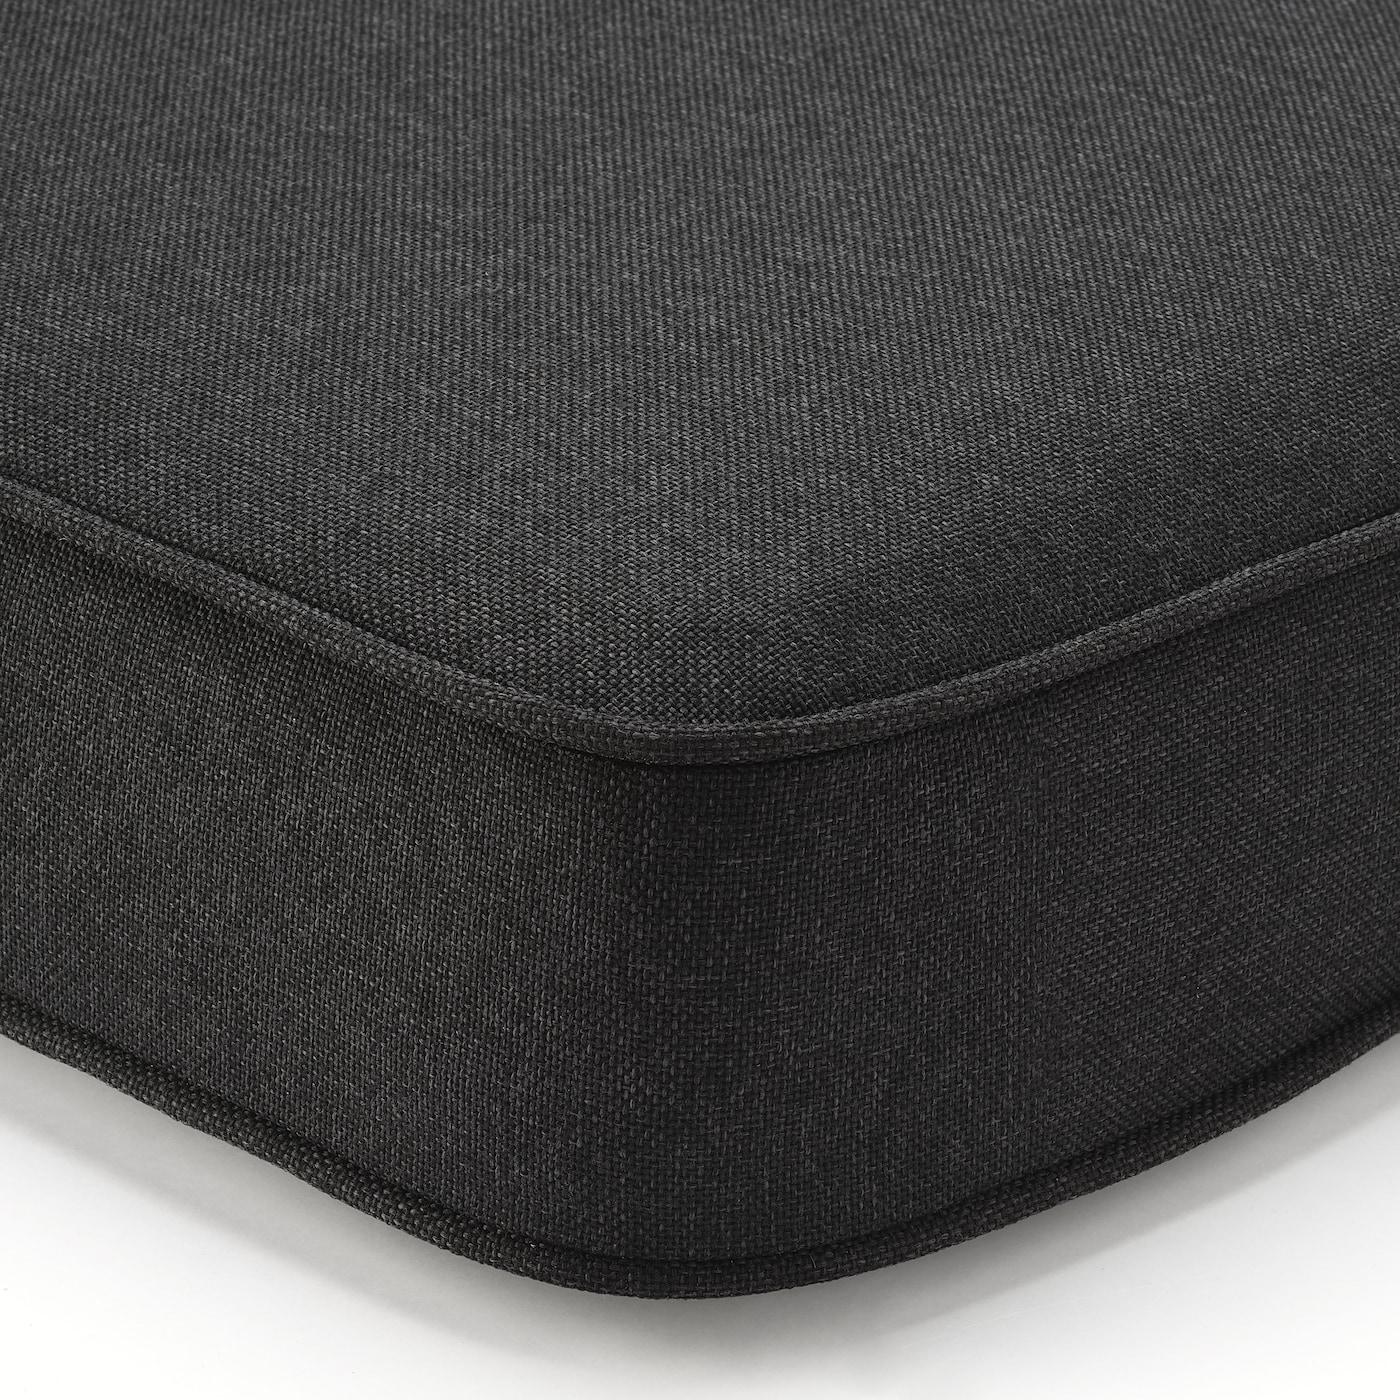 ÄPPLARÖ 3-seat modular sofa, outdoor, brown stained/Järpön/Duvholmen anthracite, 223x80x86 cm